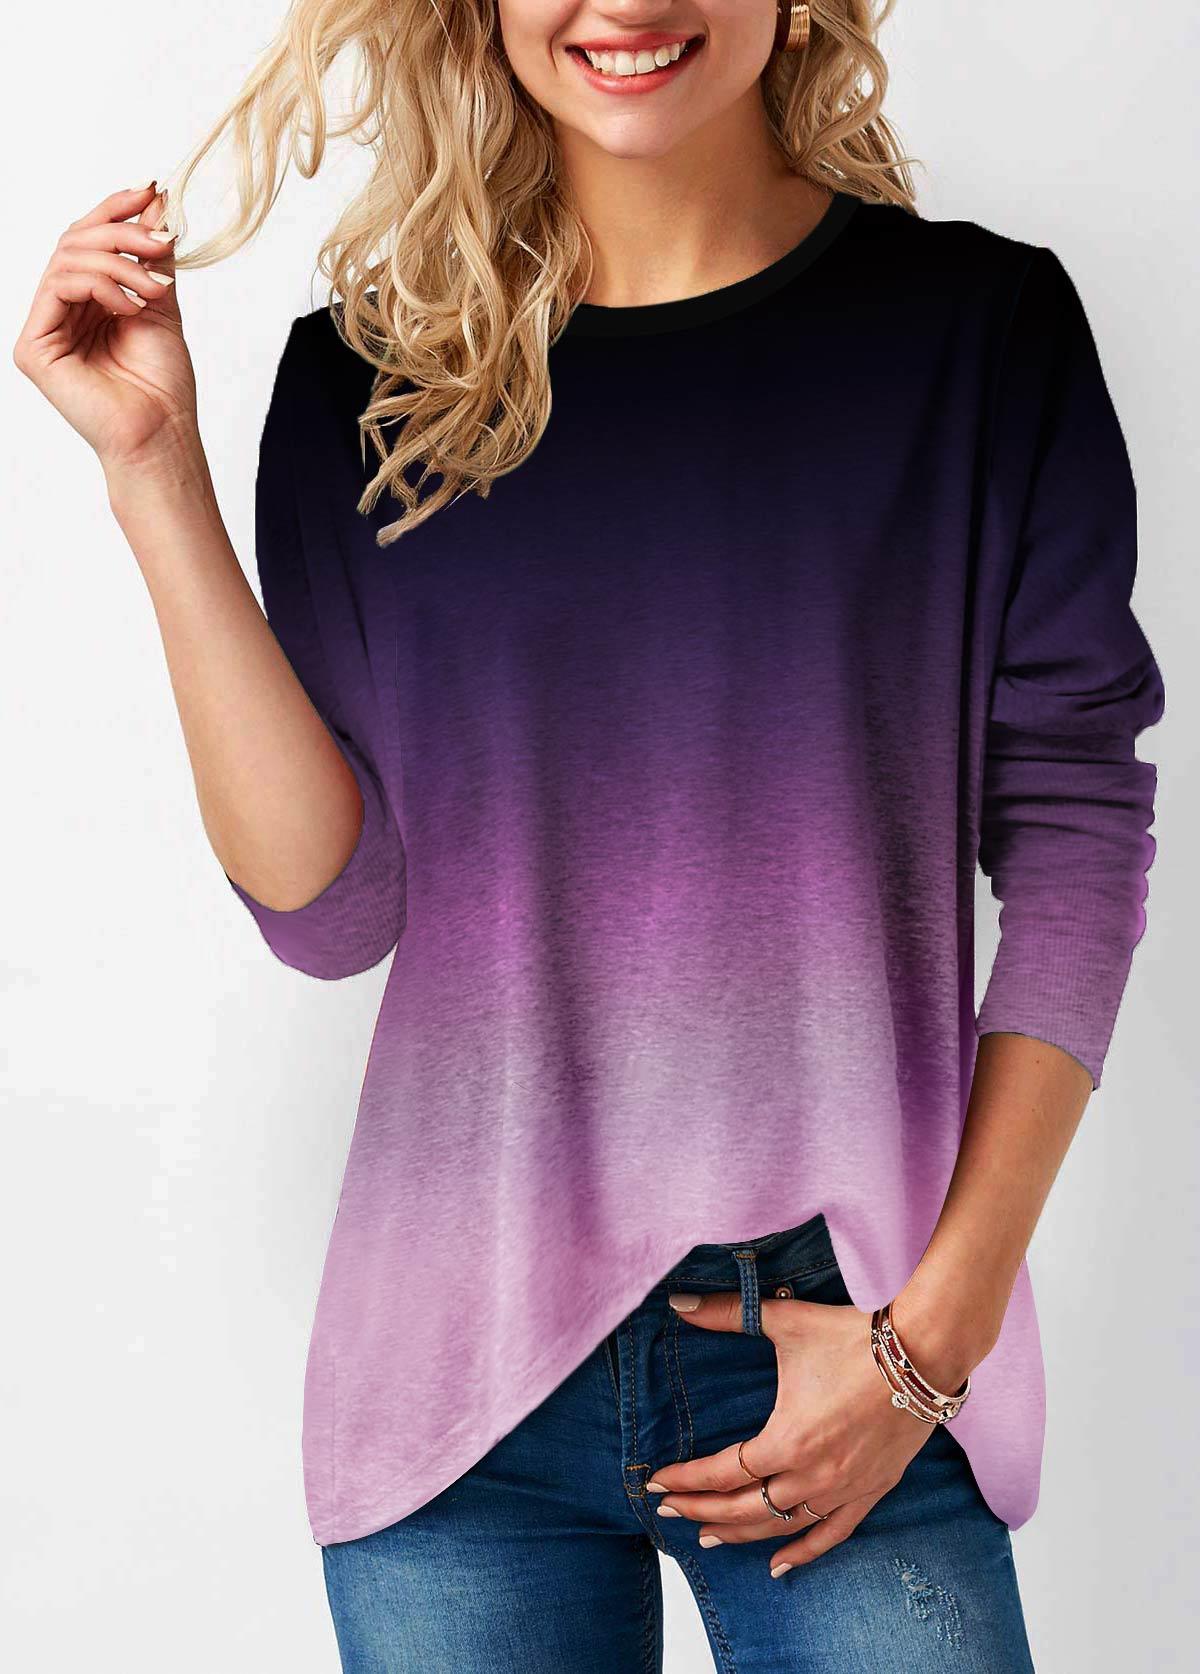 Ombre Long Sleeve Round Neck Sweatshirt